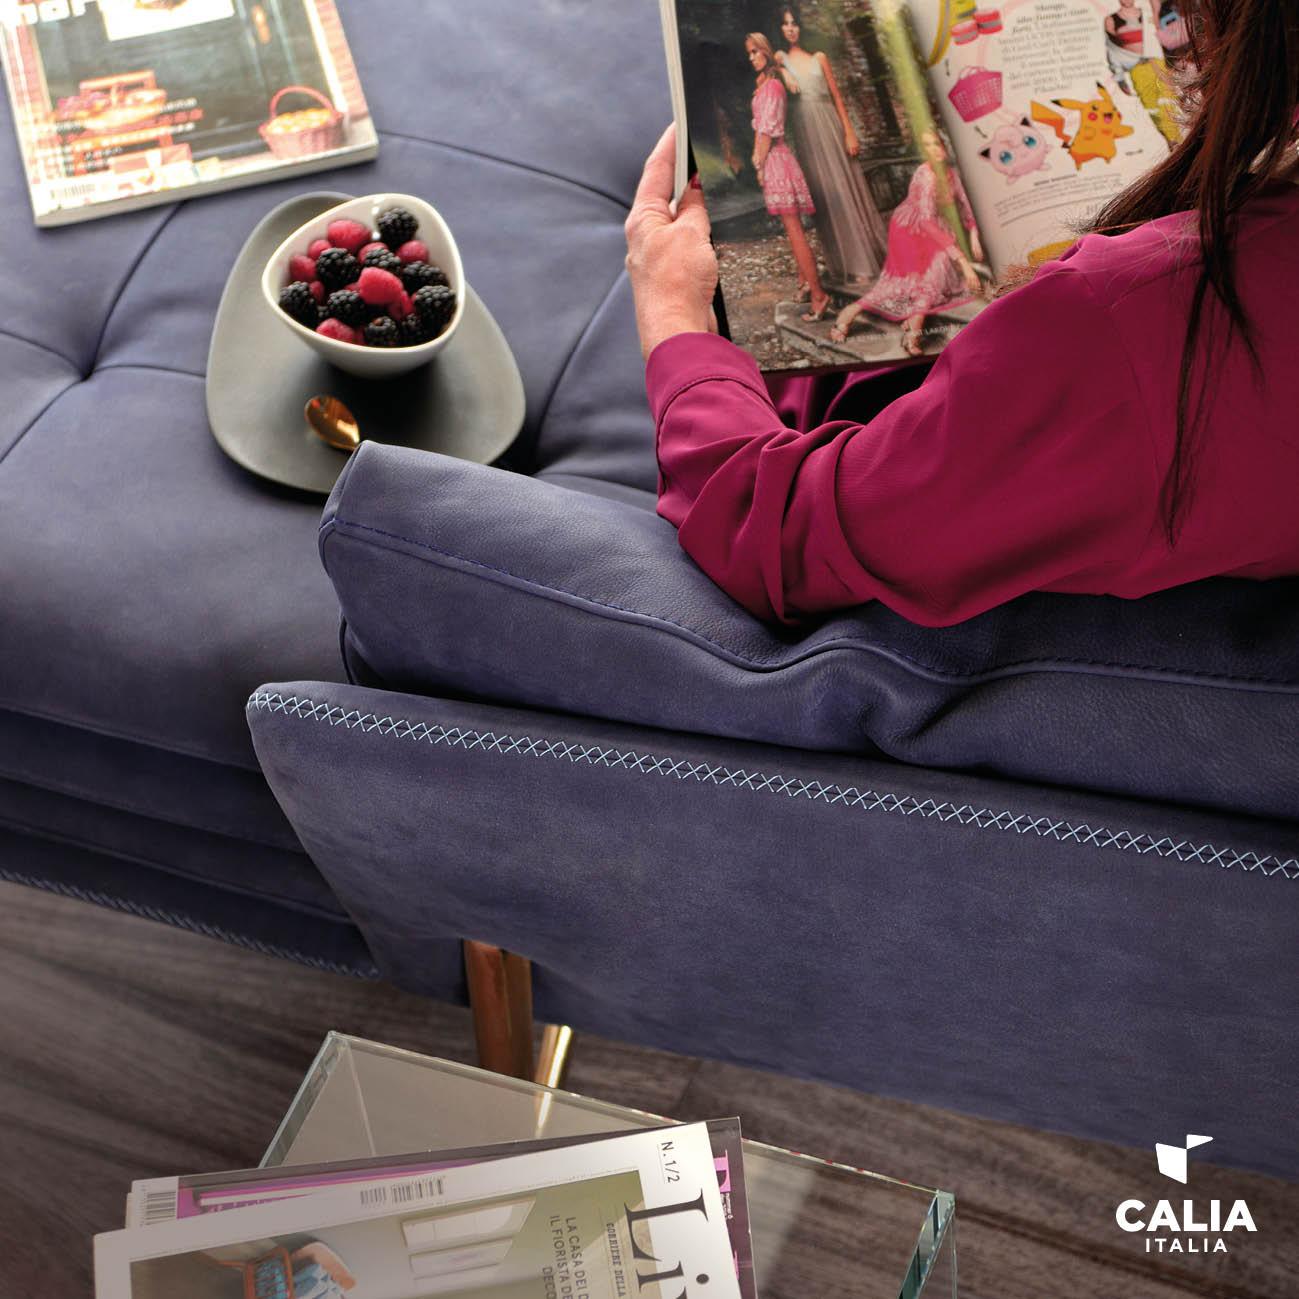 Caliaitalia - Mater Familias